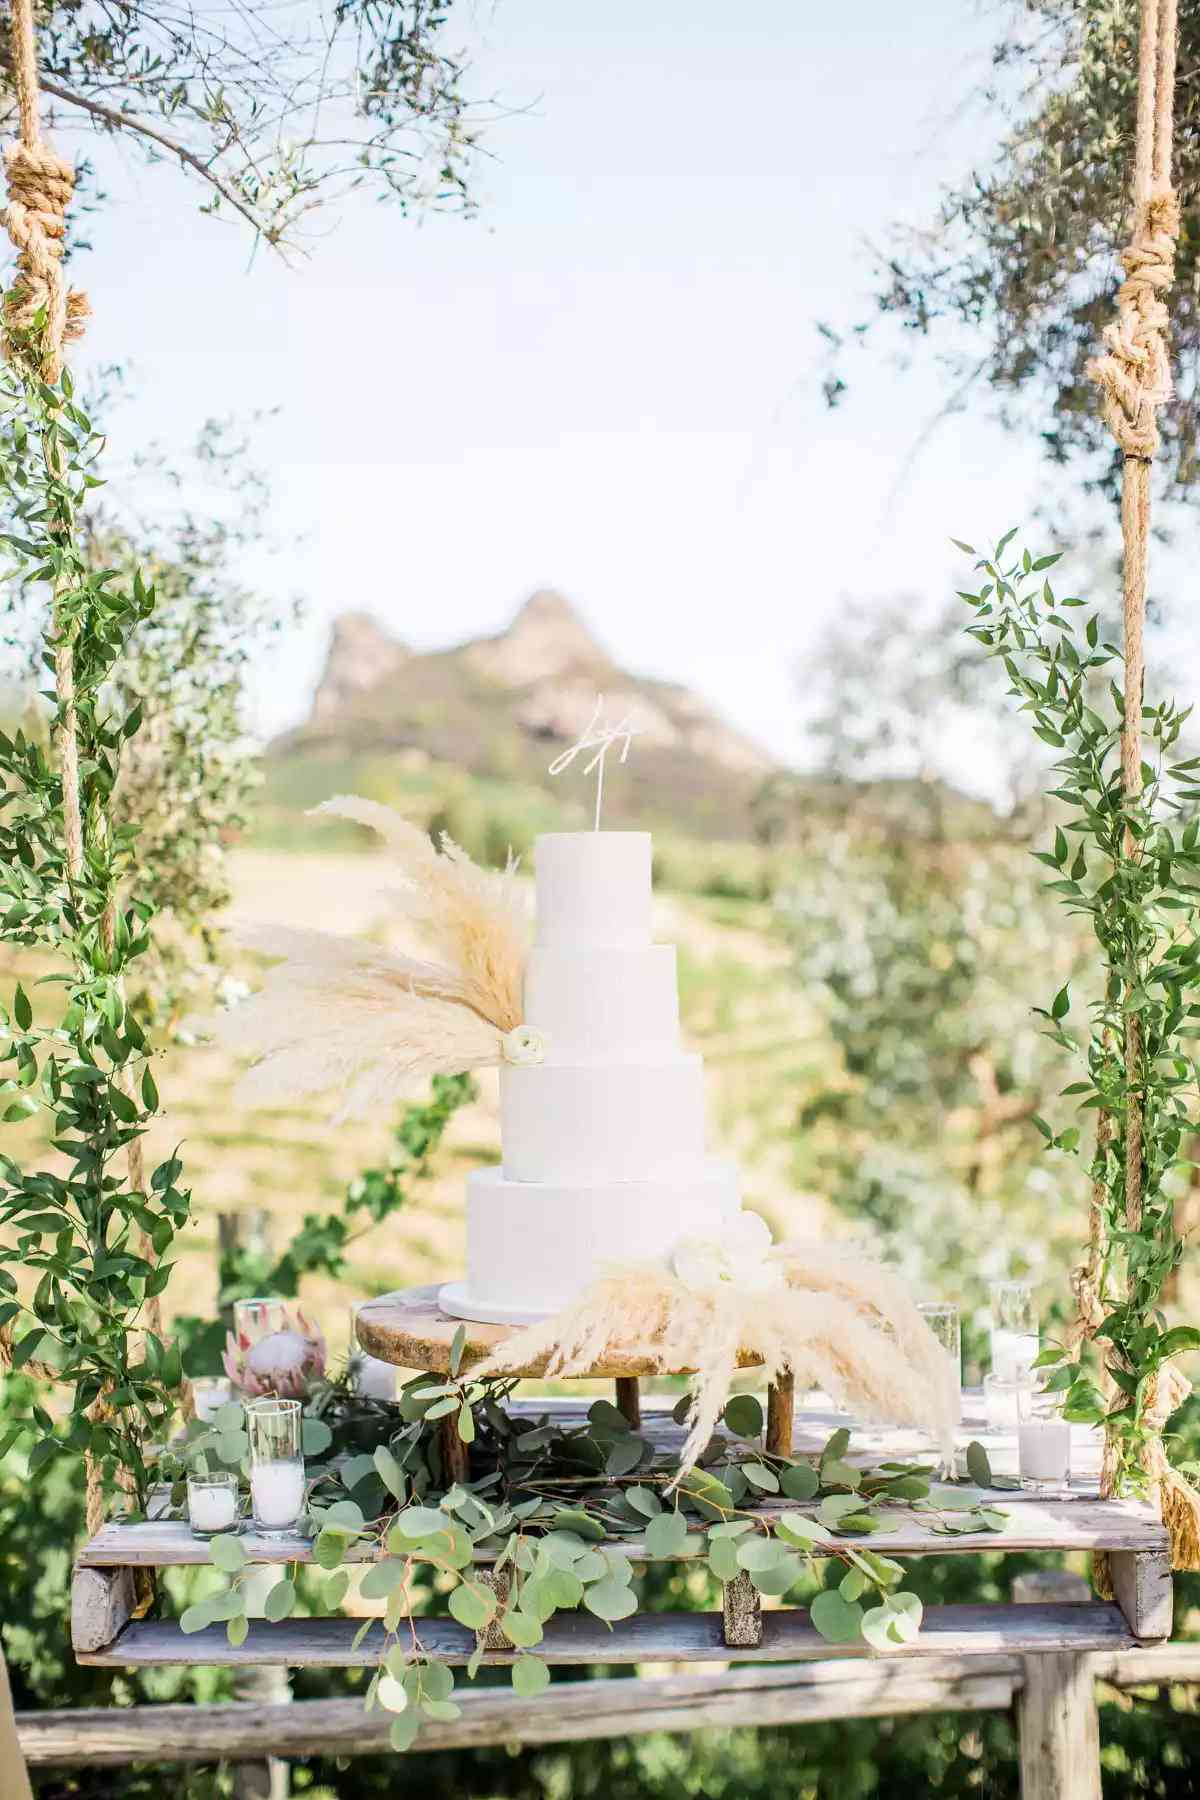 White wedding cake surrounded by greenery